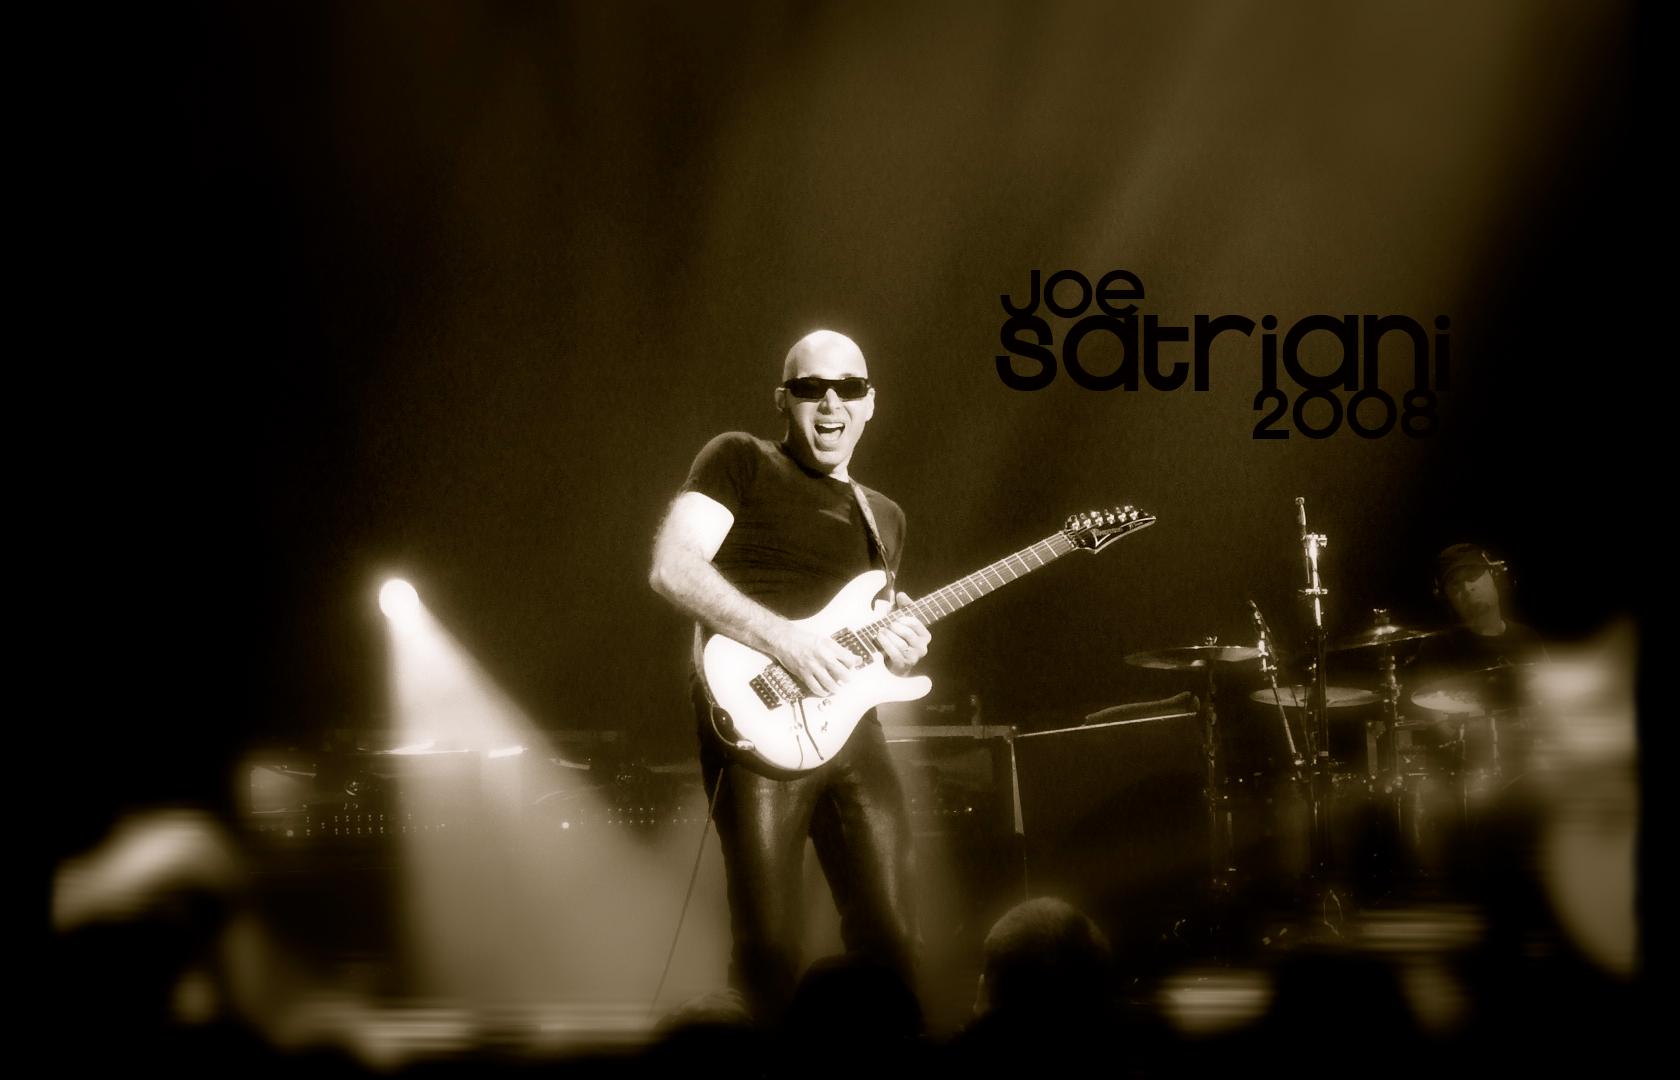 Joe Satriani Wallpaper Music   joe satriani wallpaper 1680x1080